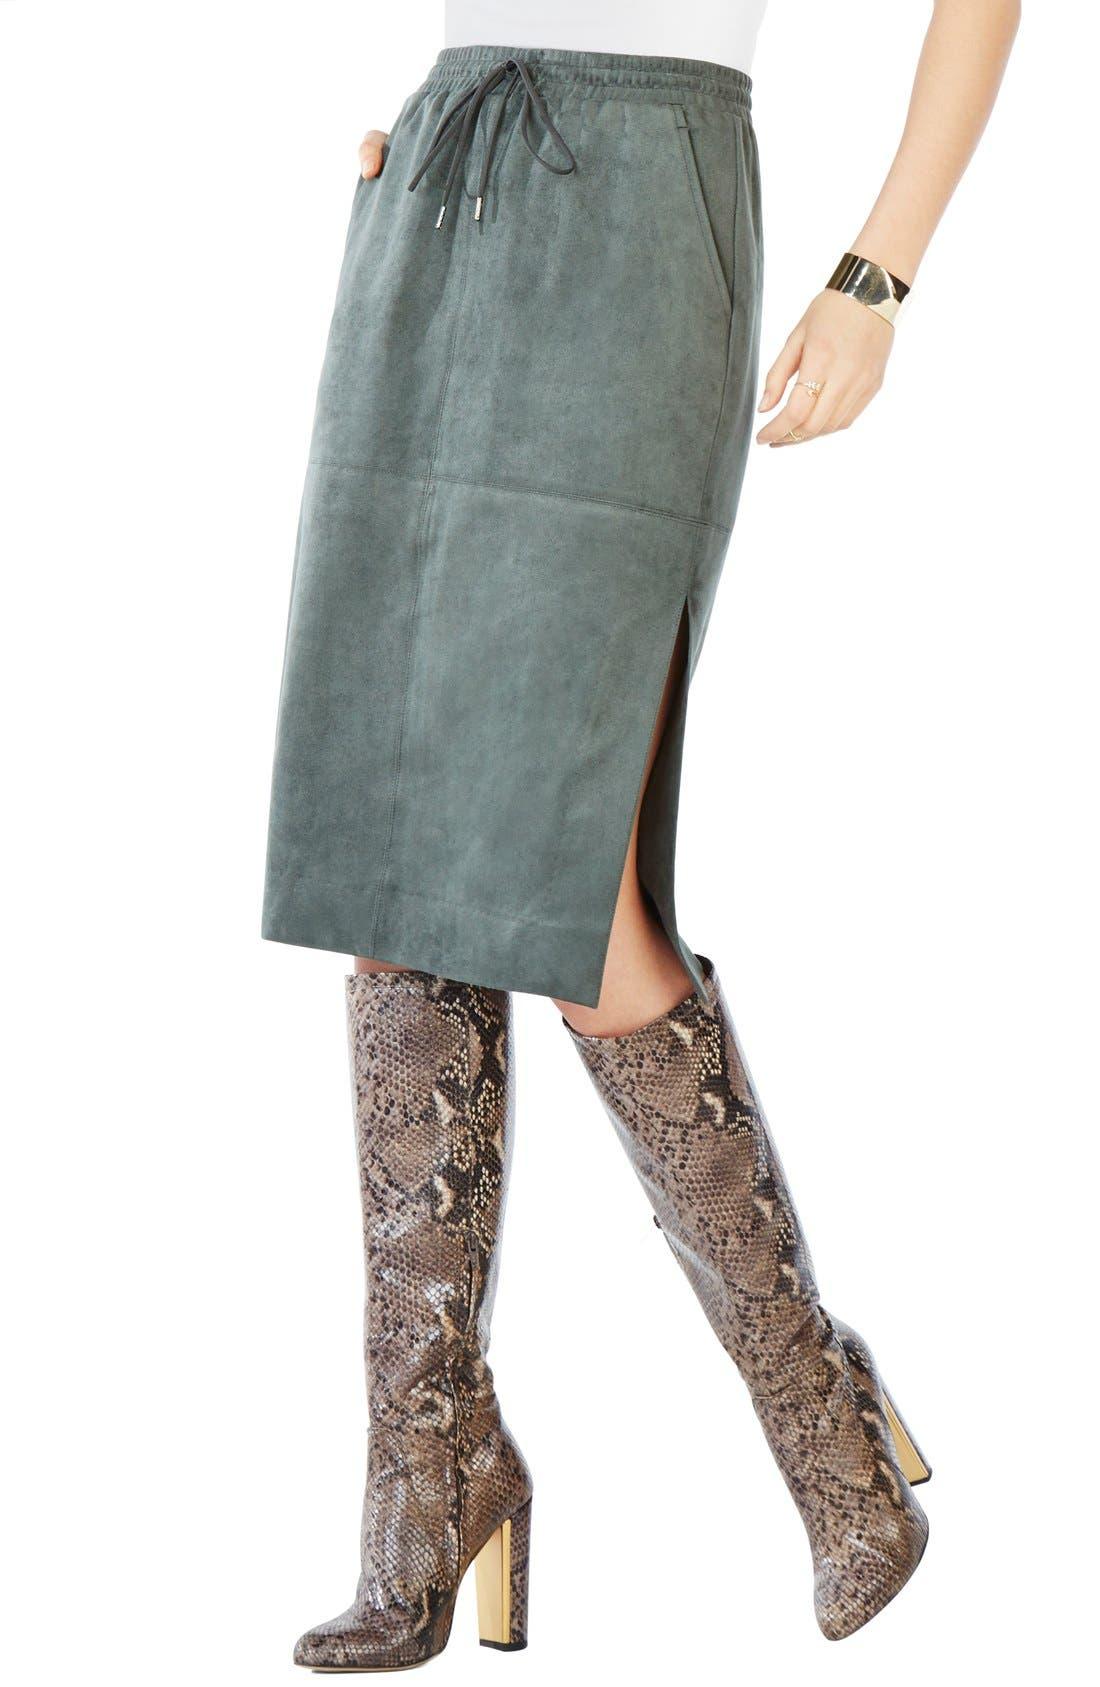 Alternate Image 1 Selected - BCBGMAXAZRIA 'Zandra' Faux Suede Pencil Skirt